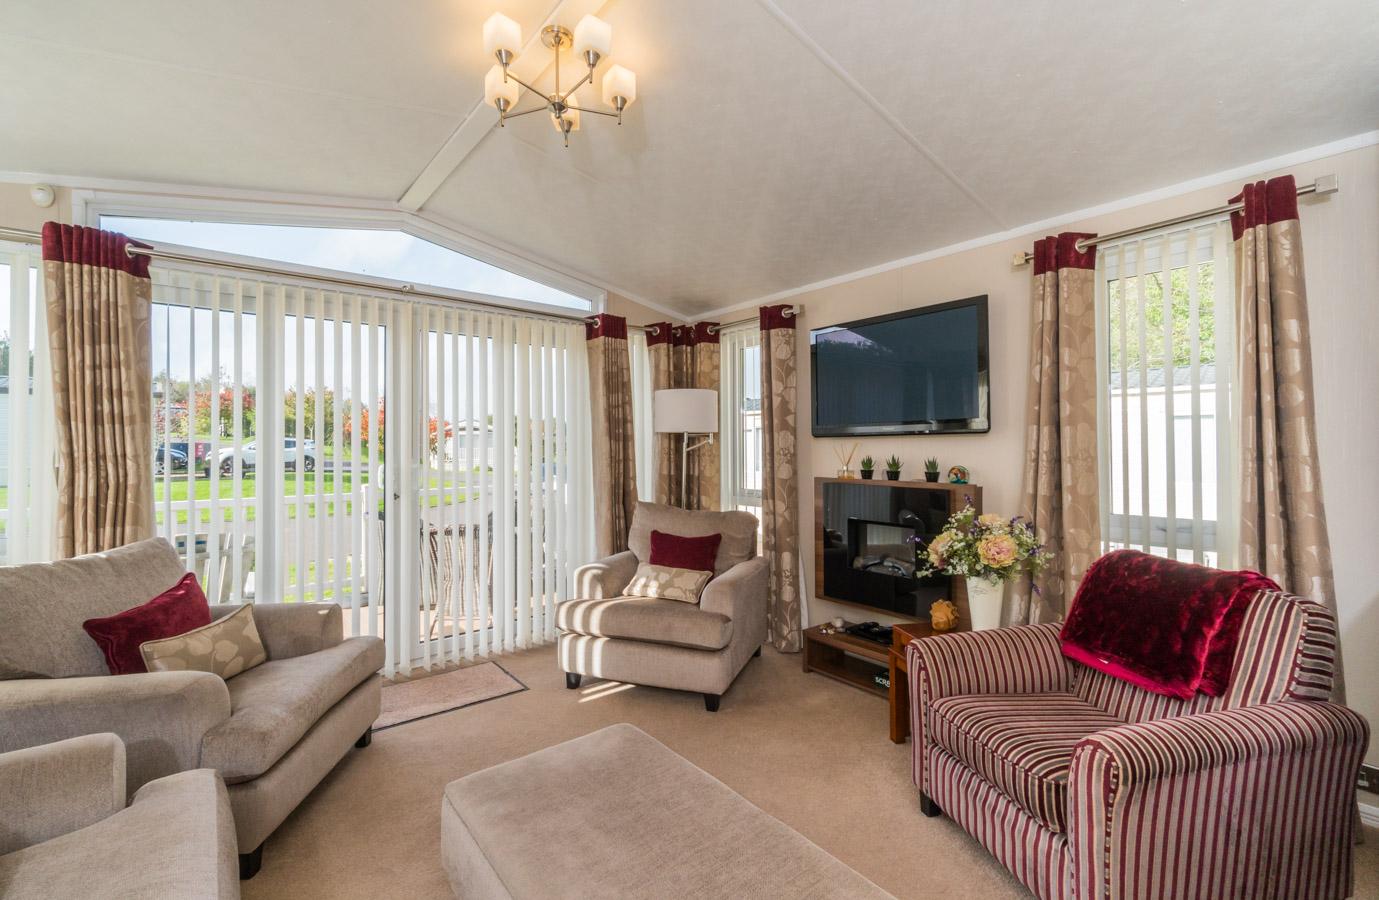 Neil-Bigwood-Monkton-Wyld-Holiday-Homes-49